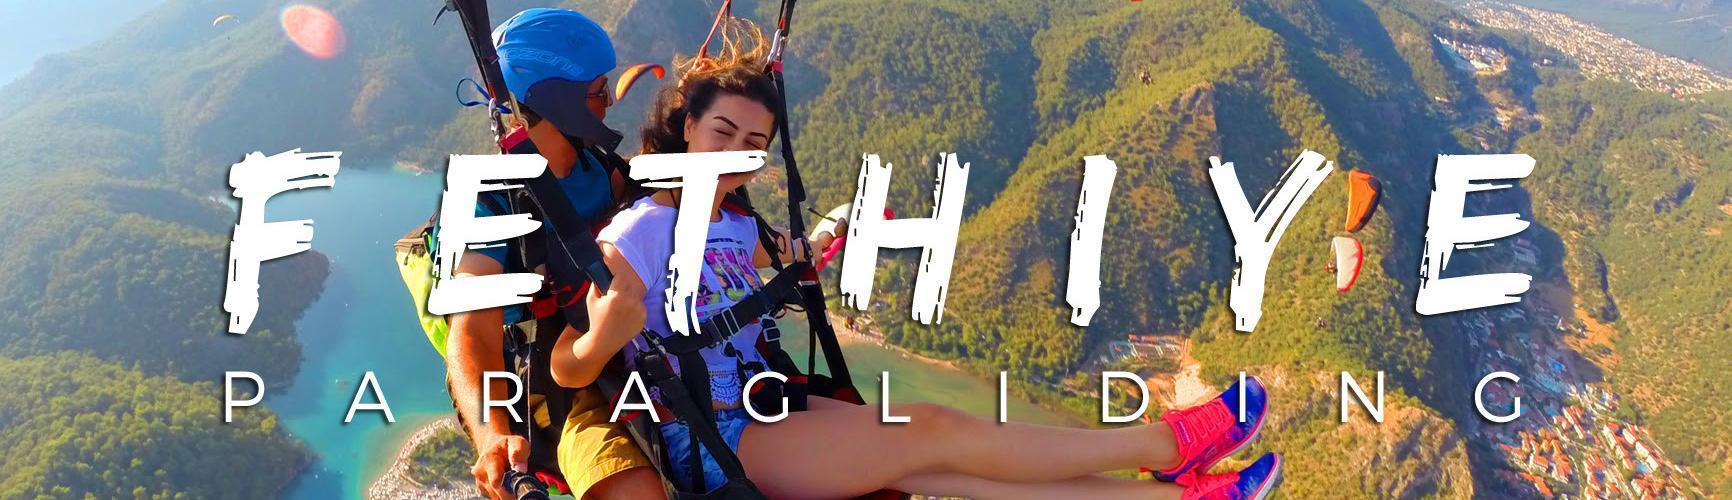 Fethiye Paragliding Experience